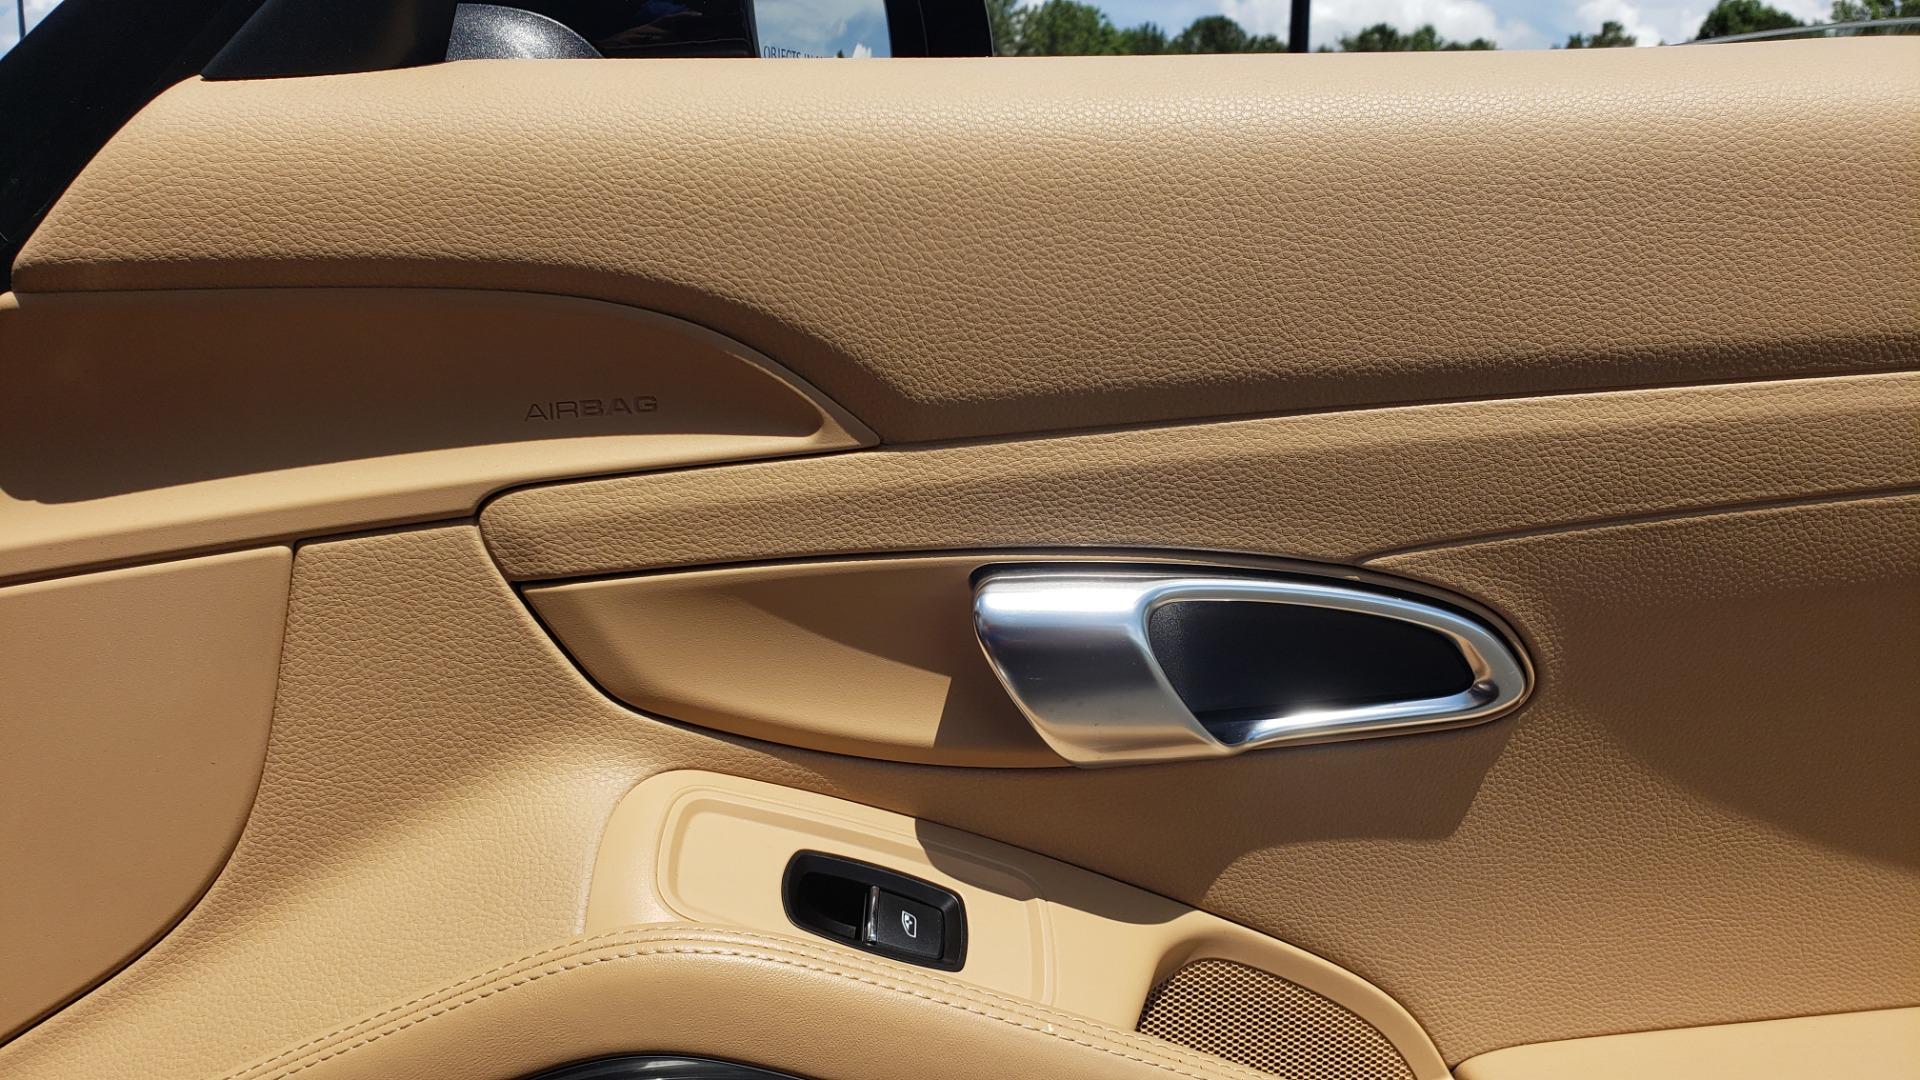 Used 2014 Porsche 911 CARRERA S CABRIOLET / PREM PKG / PDK / NAV / BOSE / SPORT CHRONO for sale $81,995 at Formula Imports in Charlotte NC 28227 39